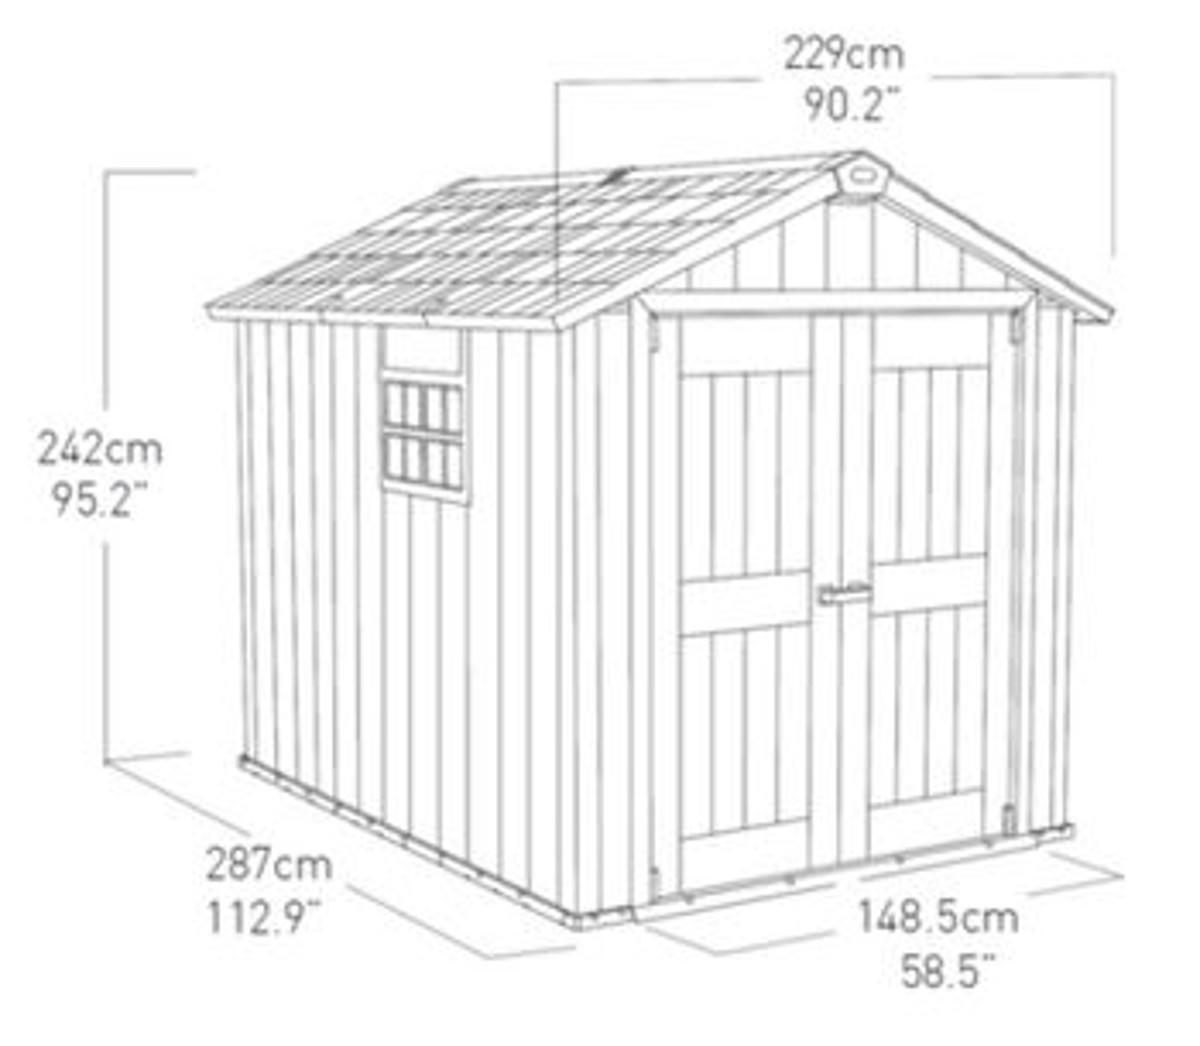 Casetta da giardino in polipropilene Oakland 759 KETER, superficie interna 5.25 m² e spessore parete 20 mm - 4